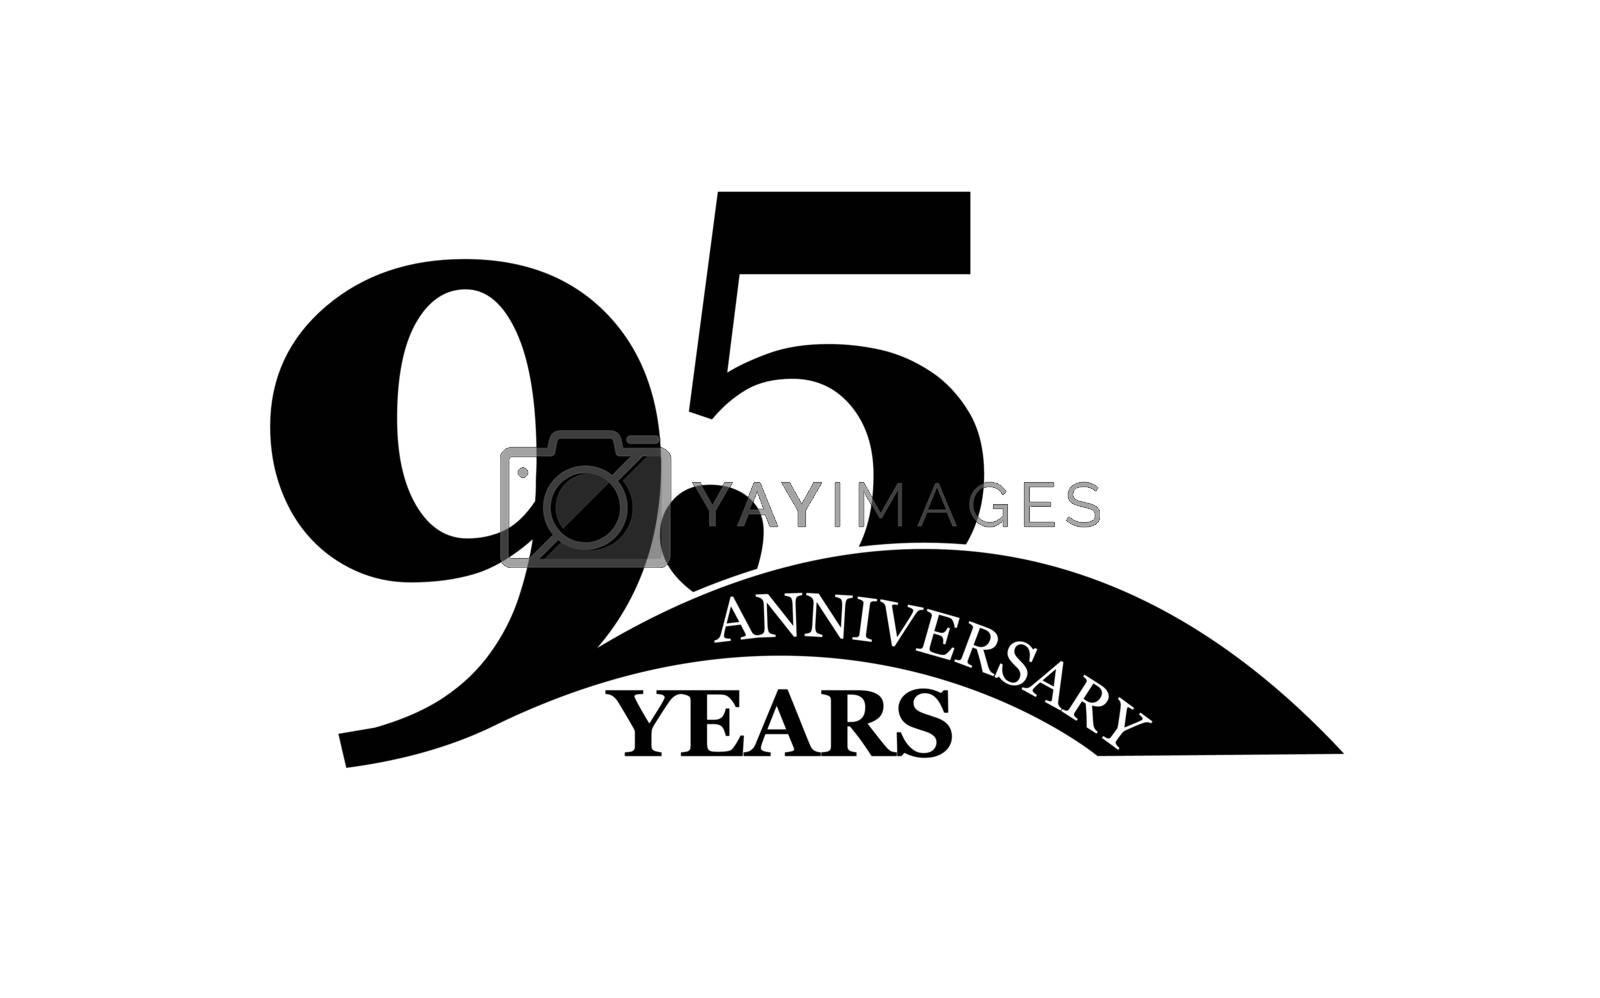 95 years anniversary, flat simple design, logo